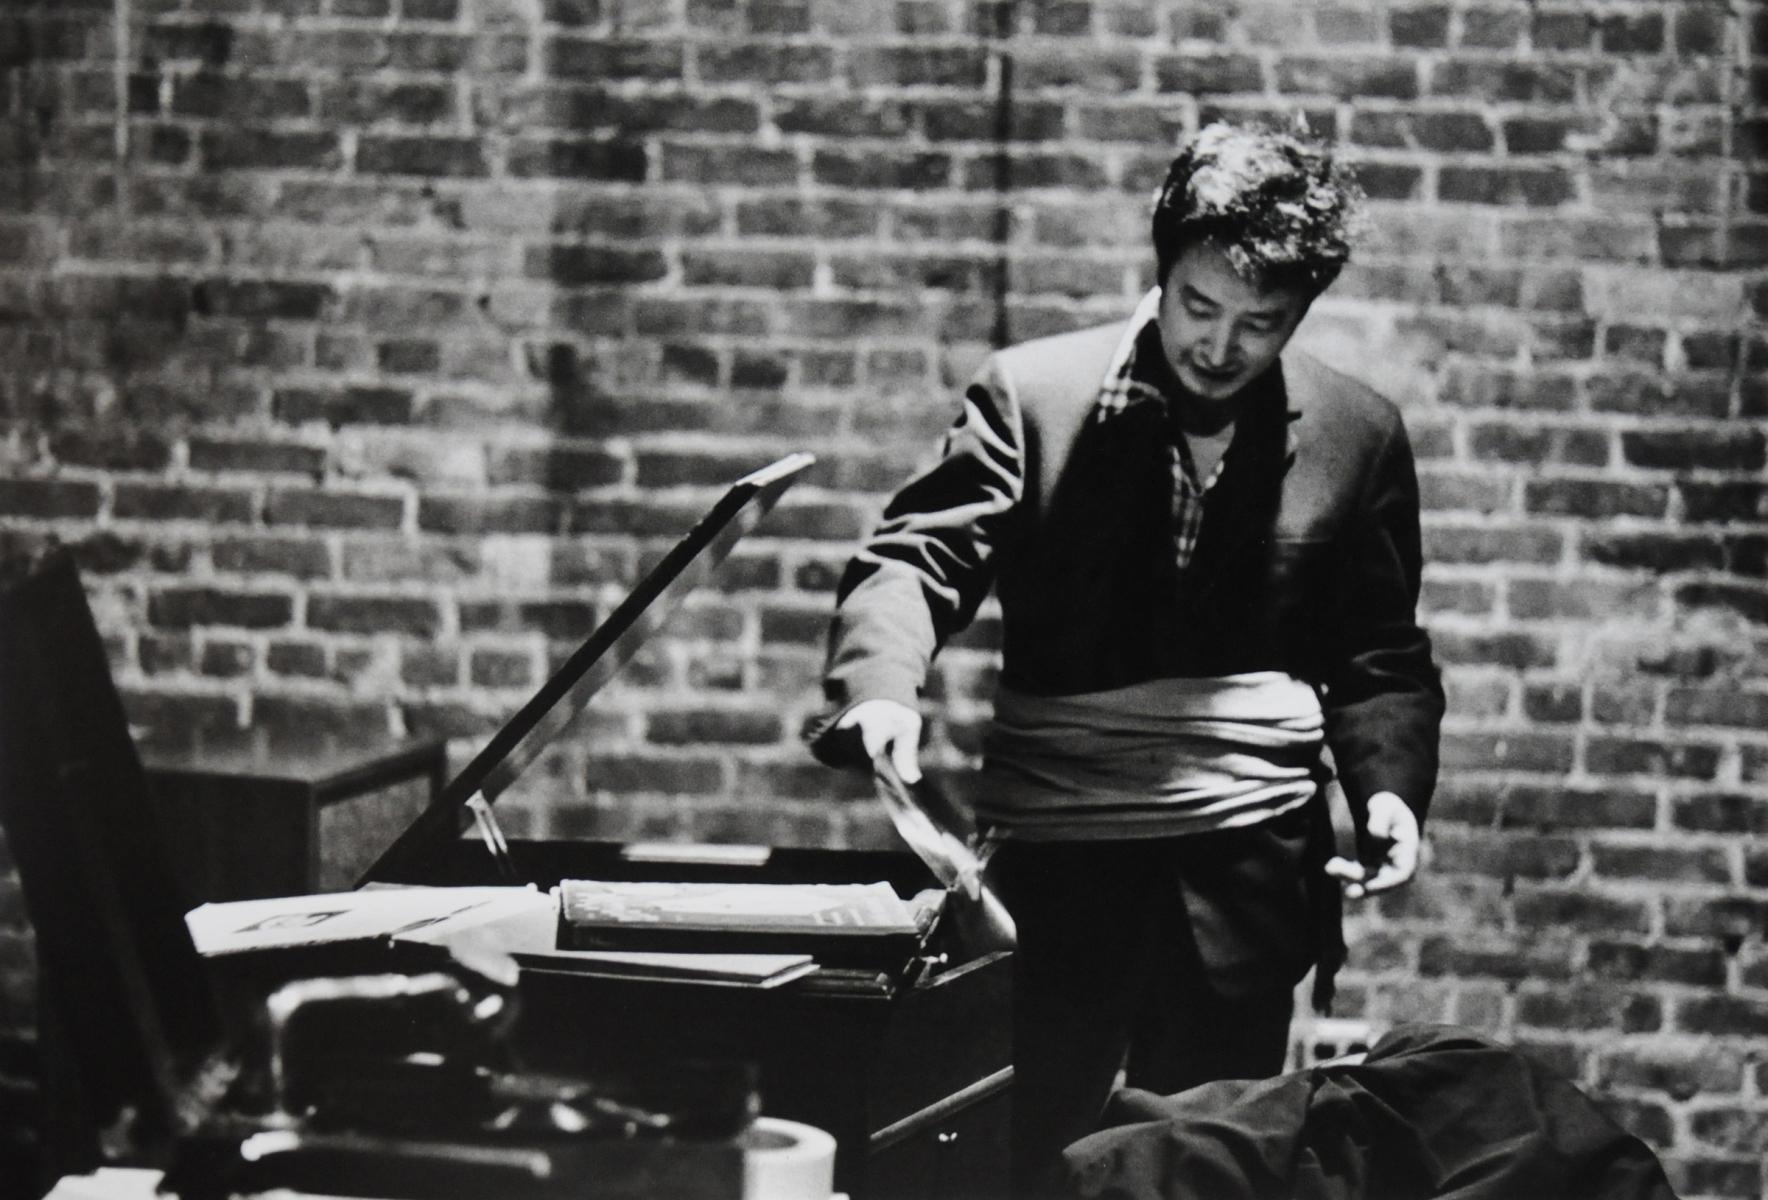 Peter Moore, Fluxus Sonata No. 4, Anthology Film Archives, New York (1975)